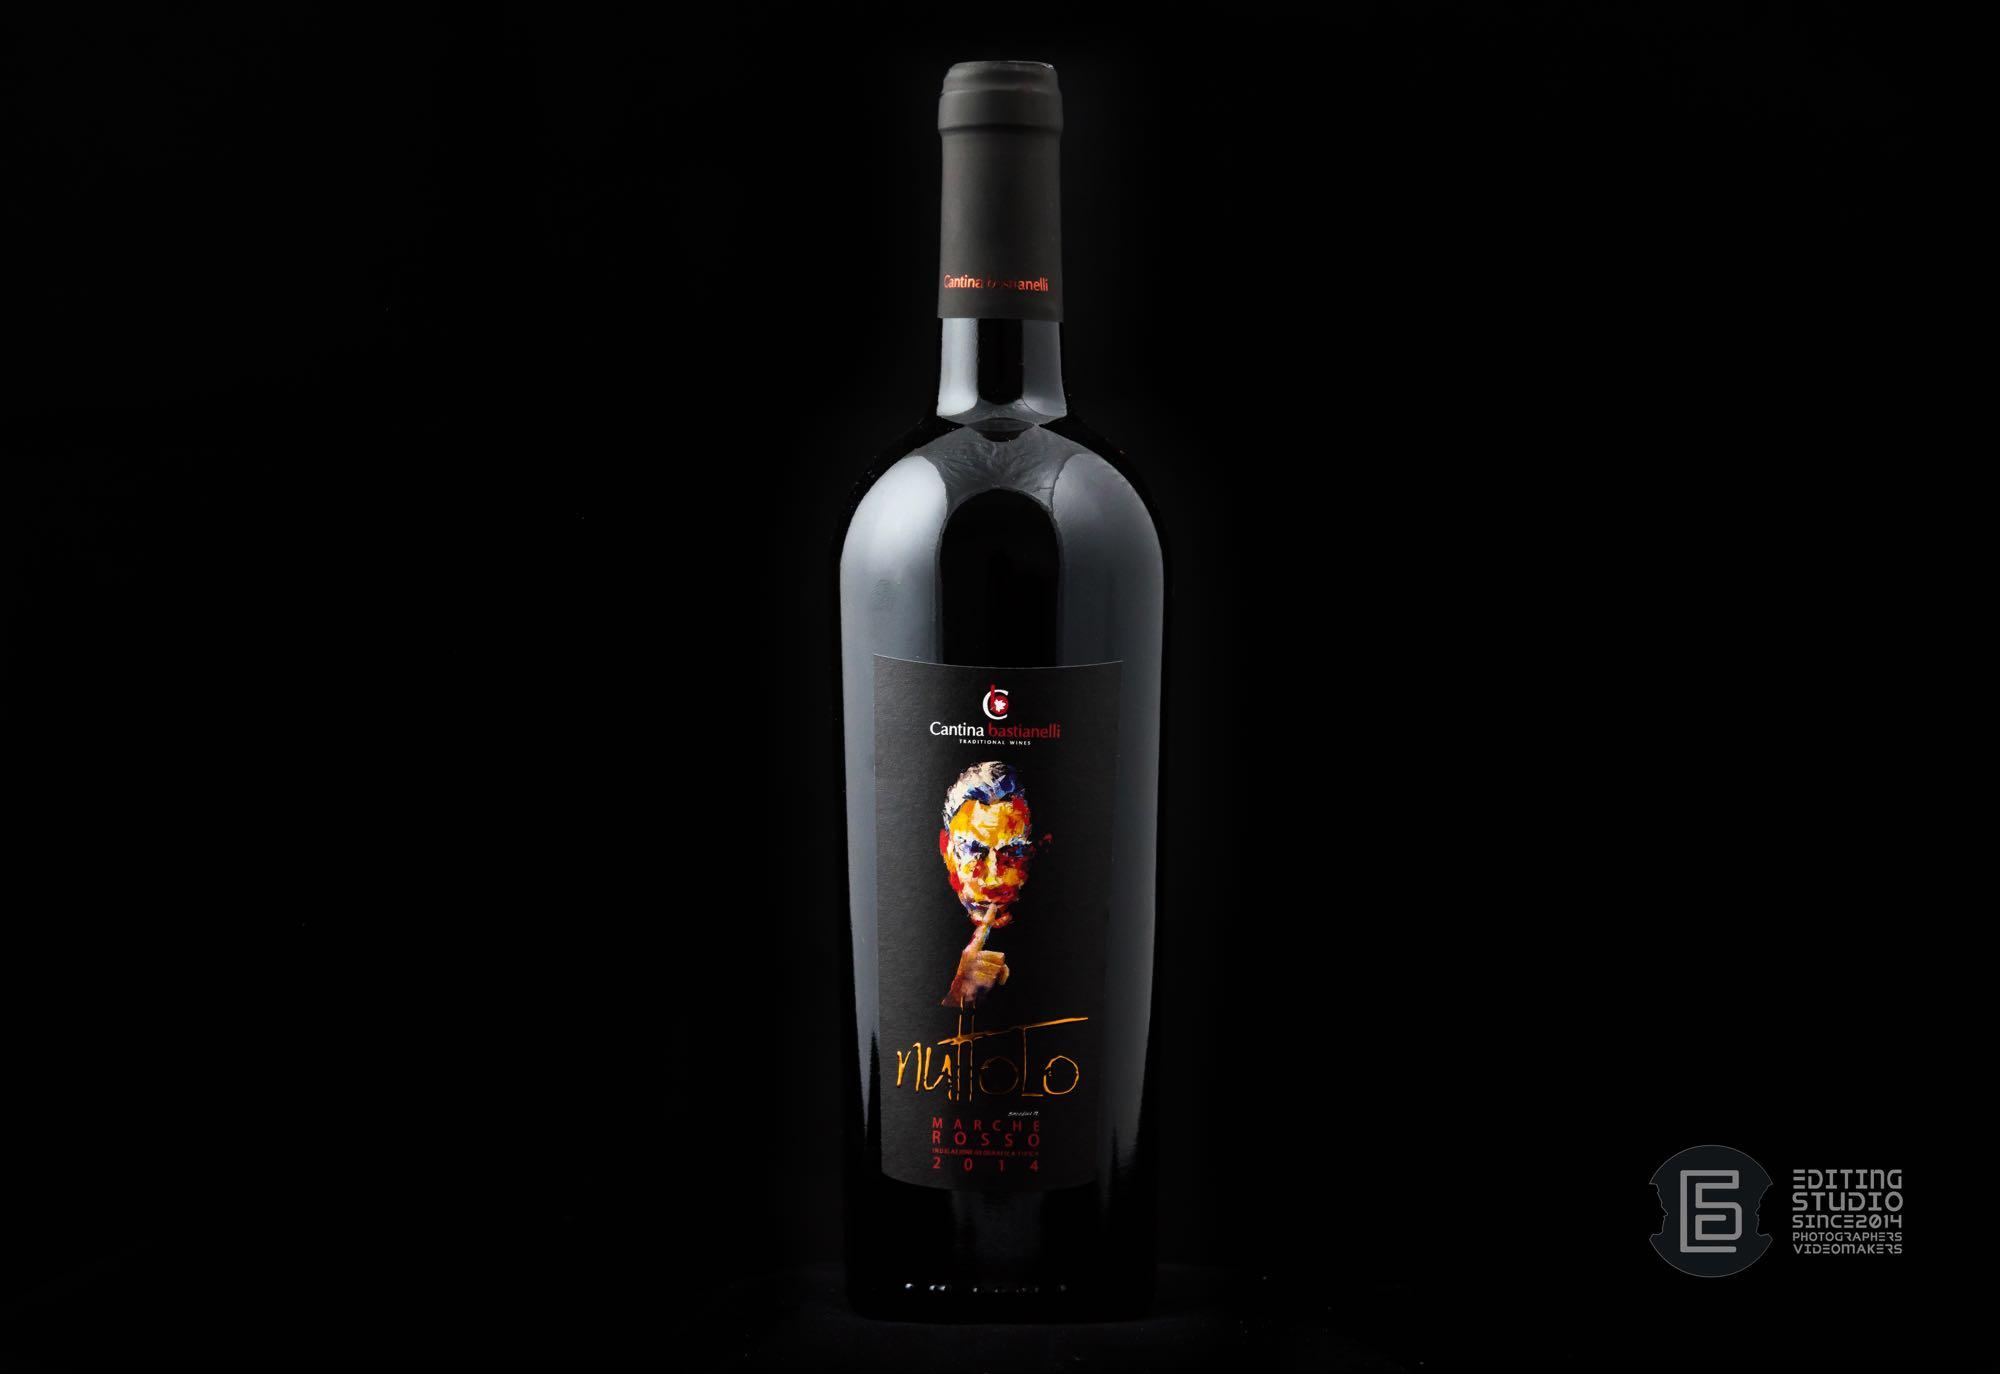 Bottiglie old08